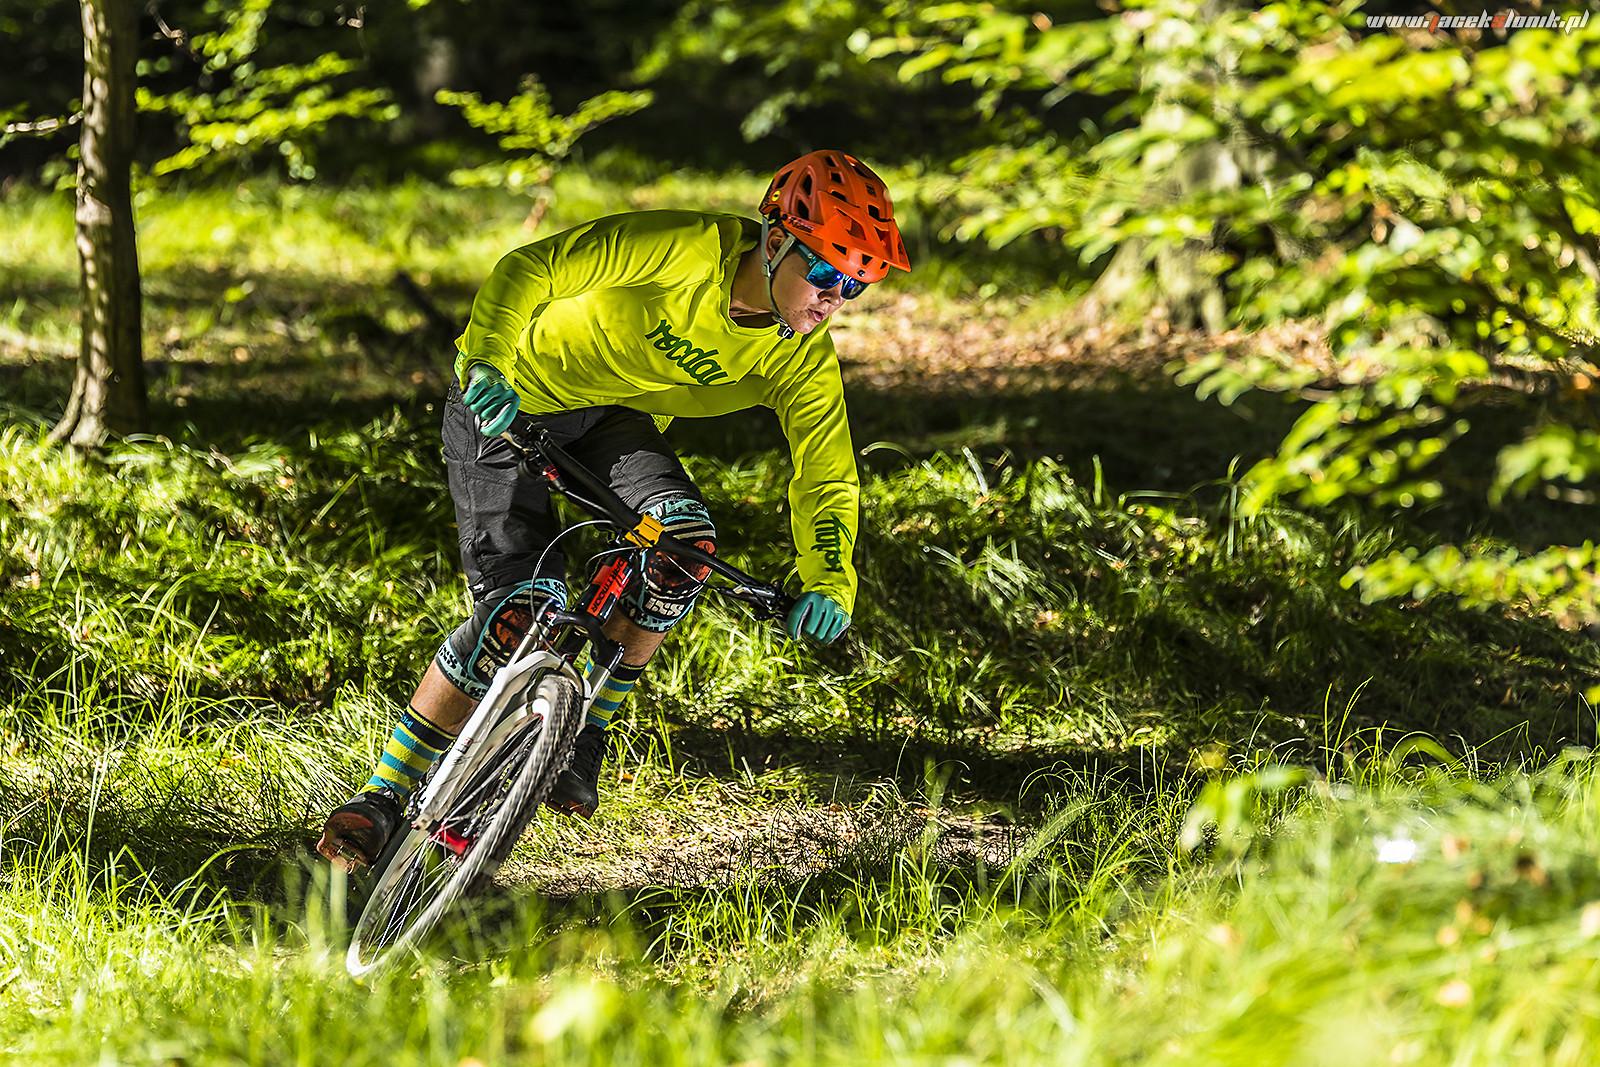 I'm enduro boy! - JacekSlonik - Mountain Biking Pictures - Vital MTB